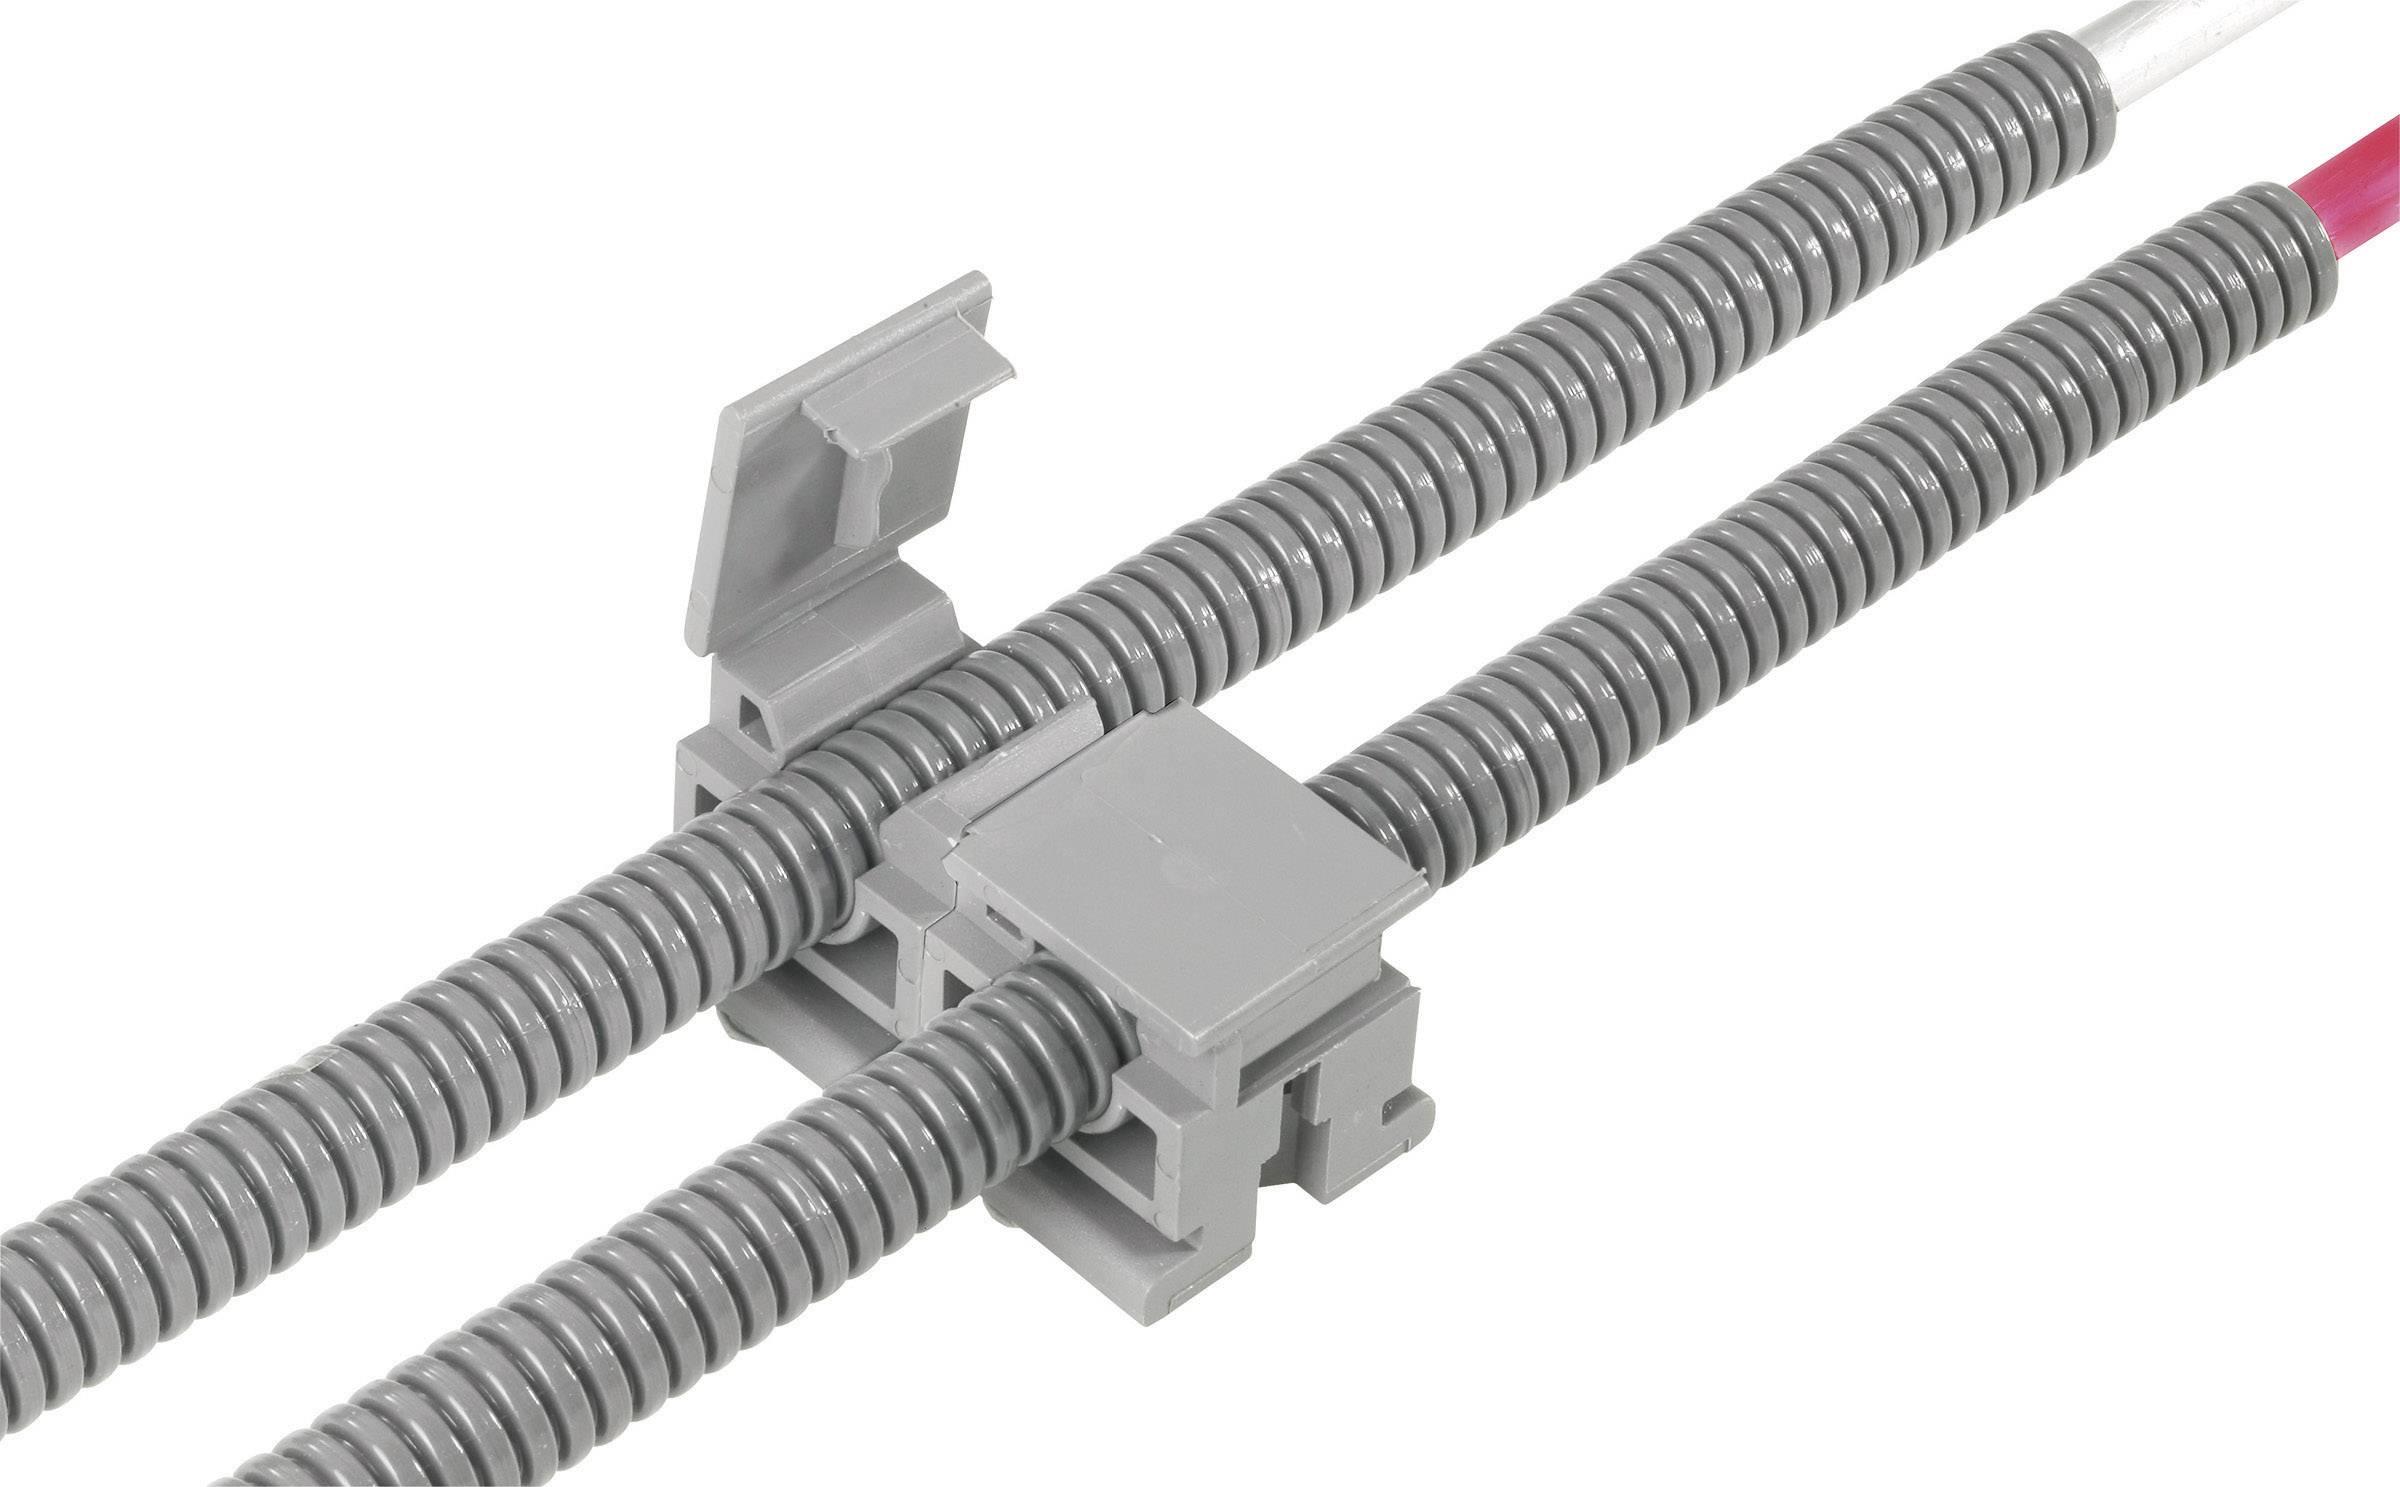 LappKabel SILVYN® KLICK-RH PG 7 65500300, 6.50 mm, sivá, 1 ks